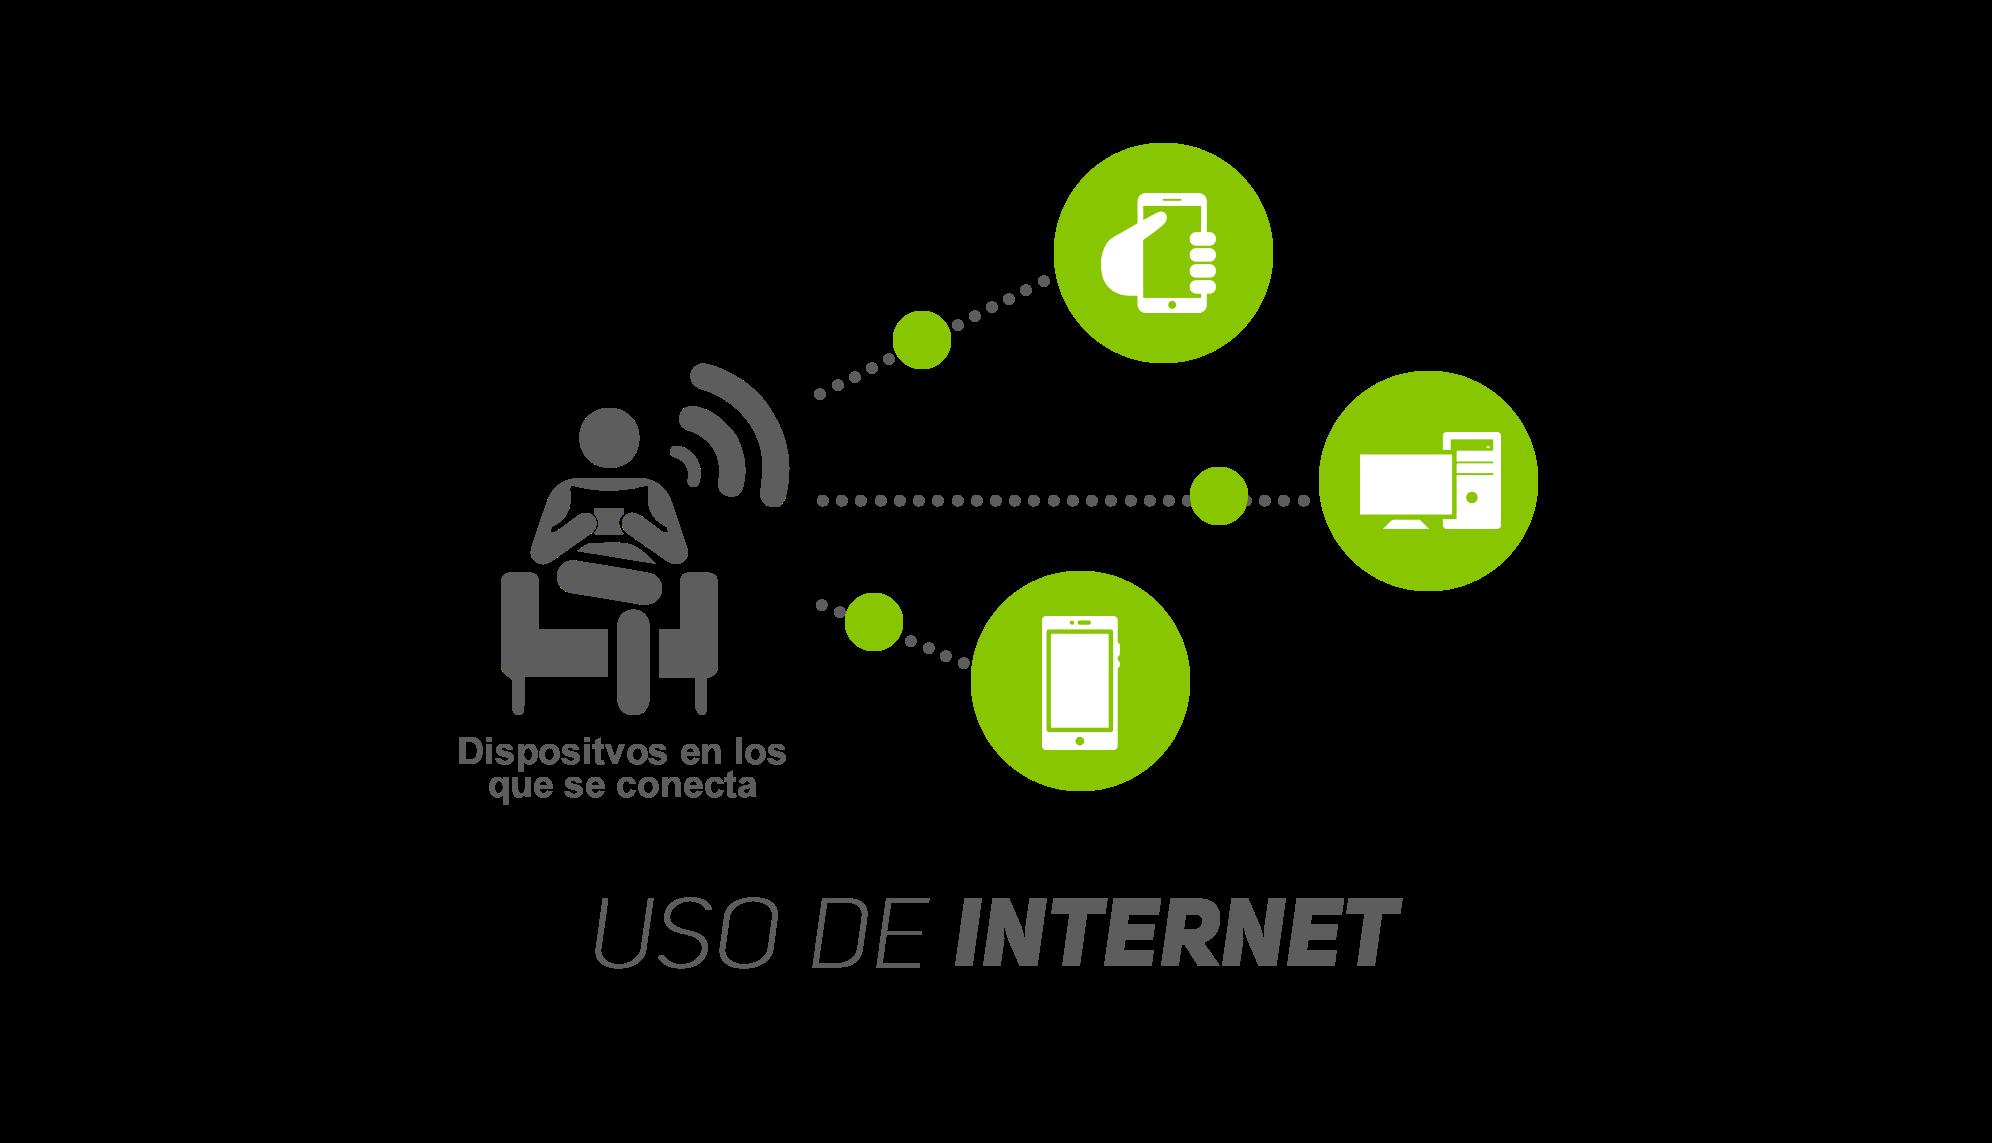 Uso de Internet 2015